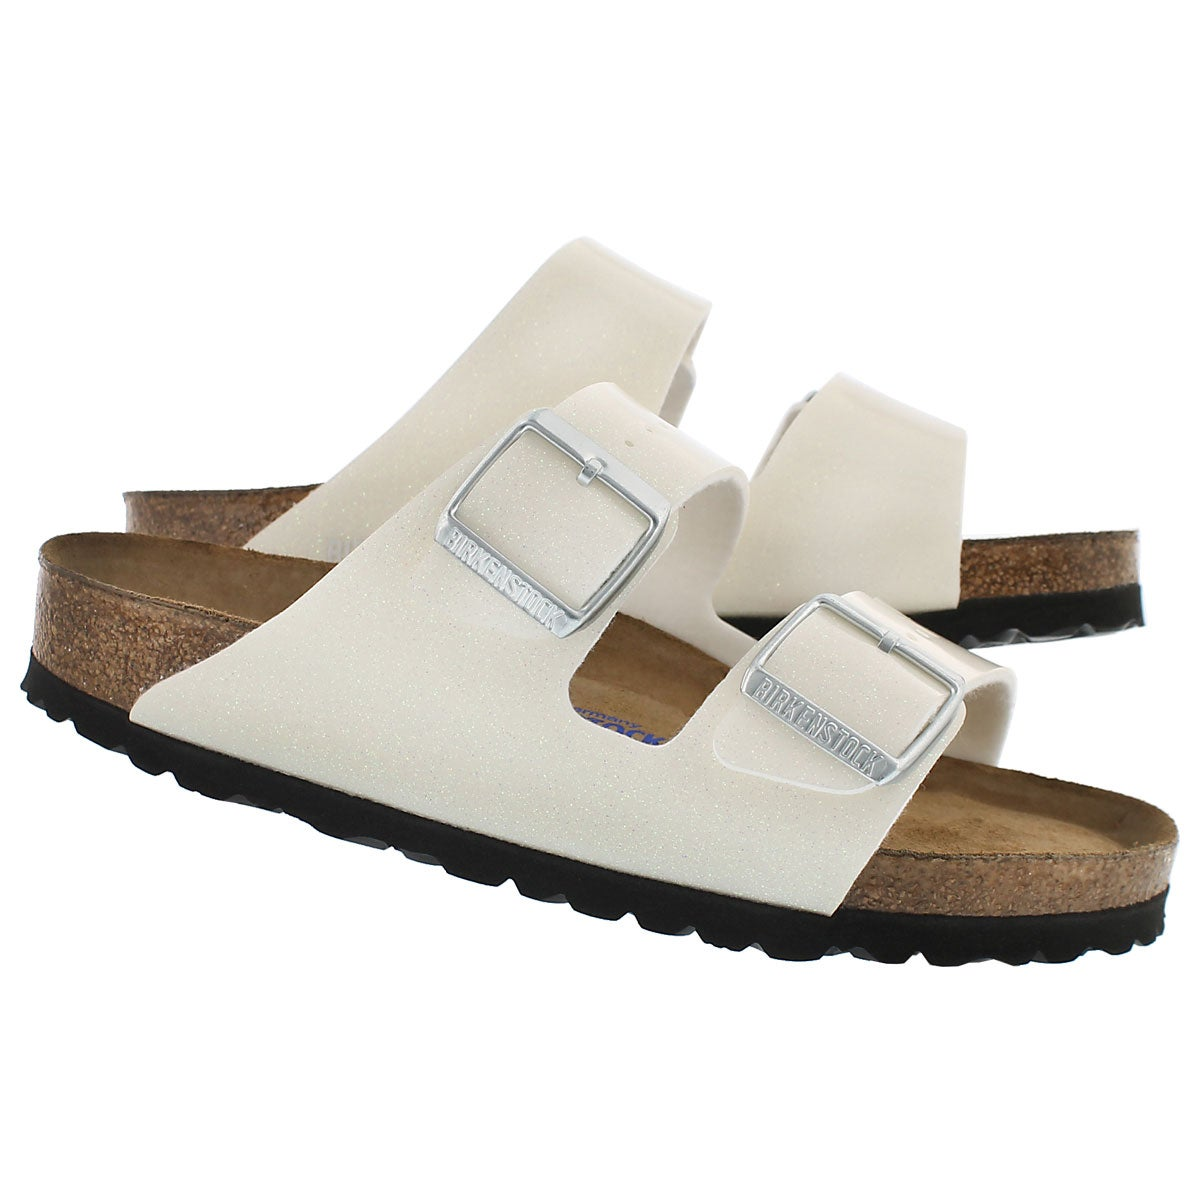 Lds Arizona magic galxay wht sandal SF